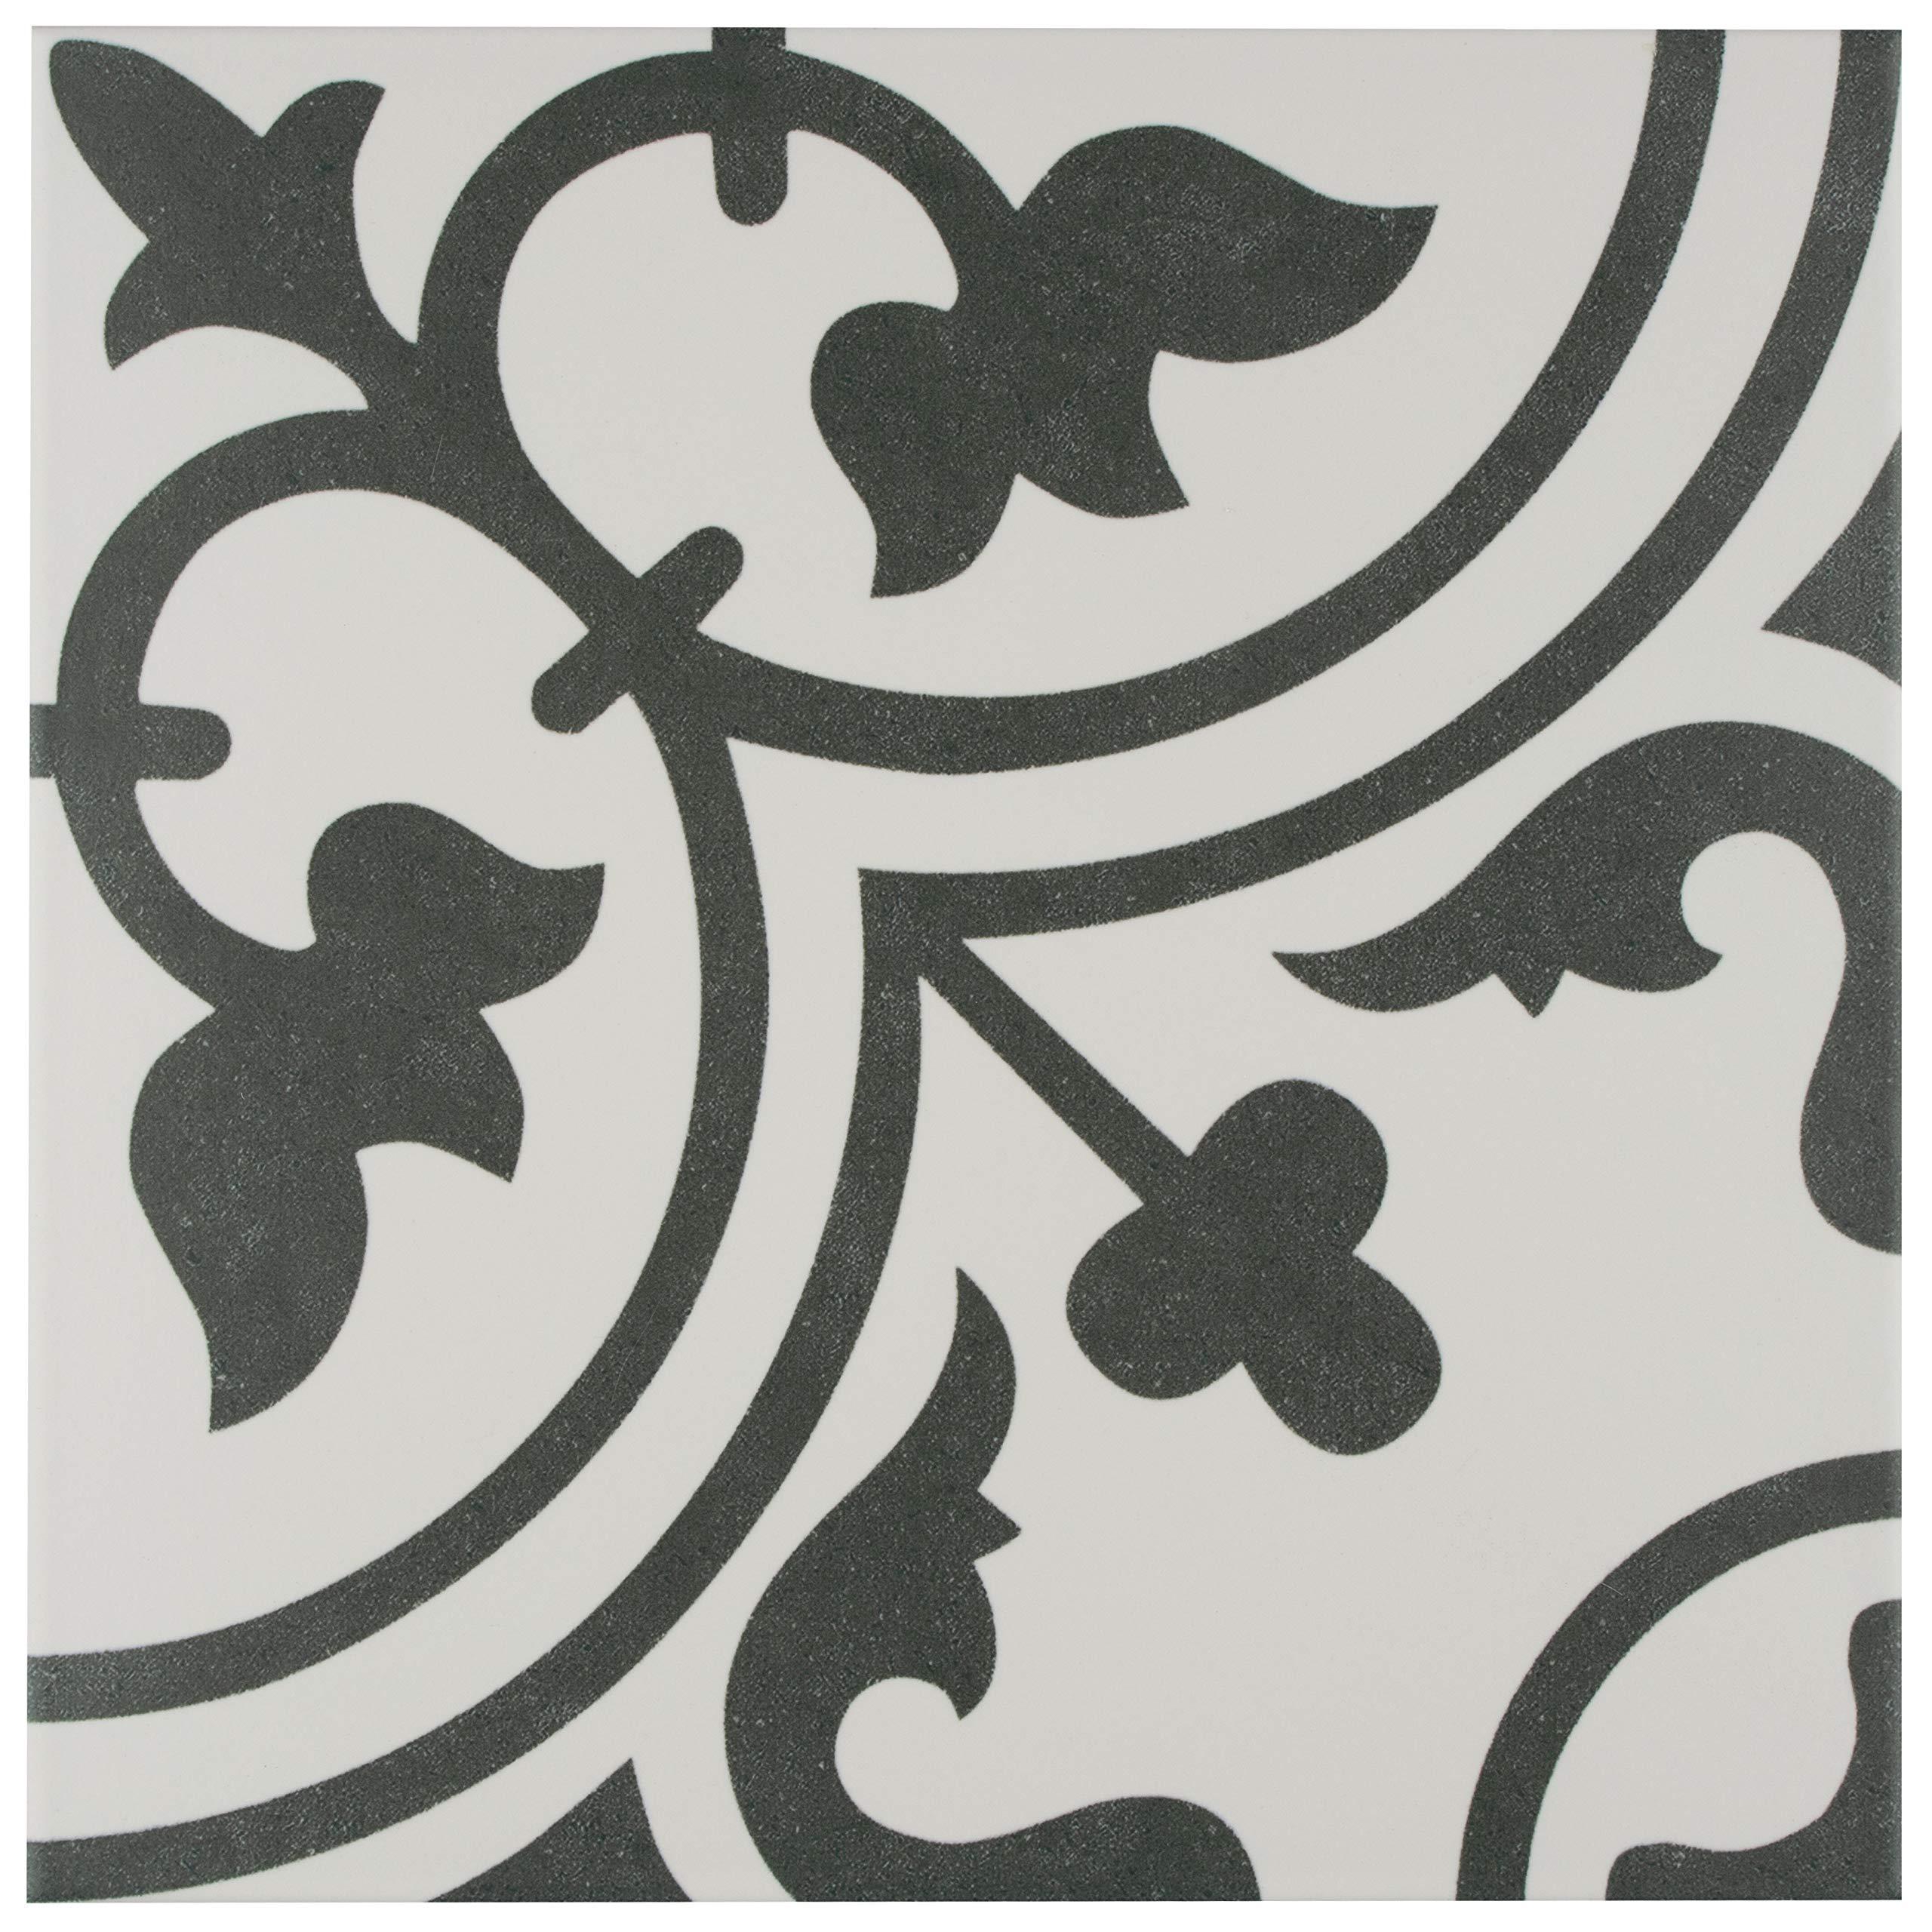 SomerTile FCD10ARW Burlesque Porcelain Floor and Wall Tile, 9.75'' x 9.75'', Black/Grey/White